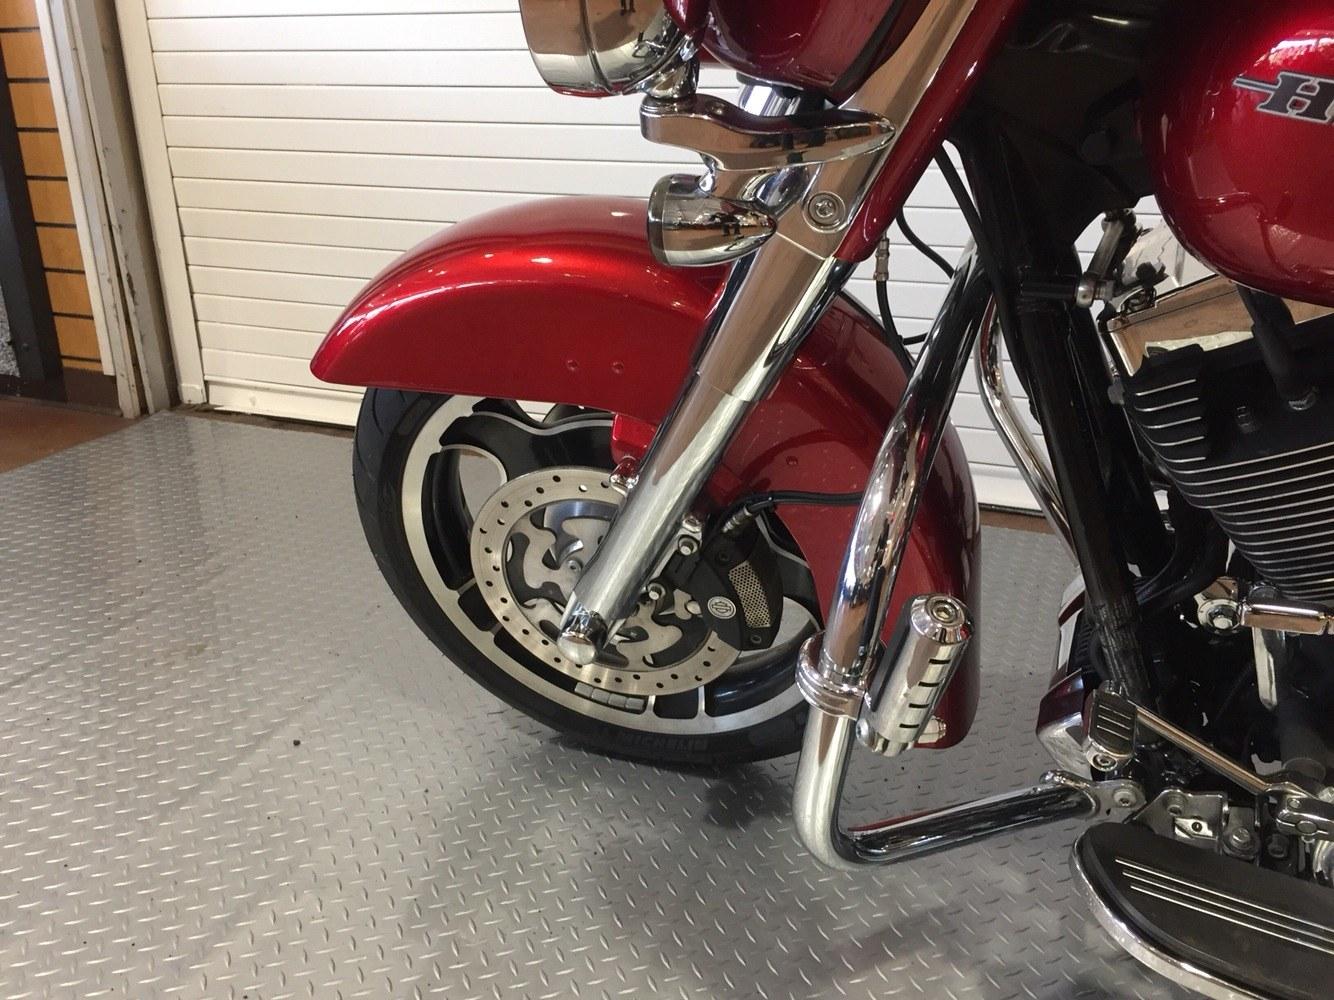 2013 Harley-Davidson Street Glide® in Massapequa, New York